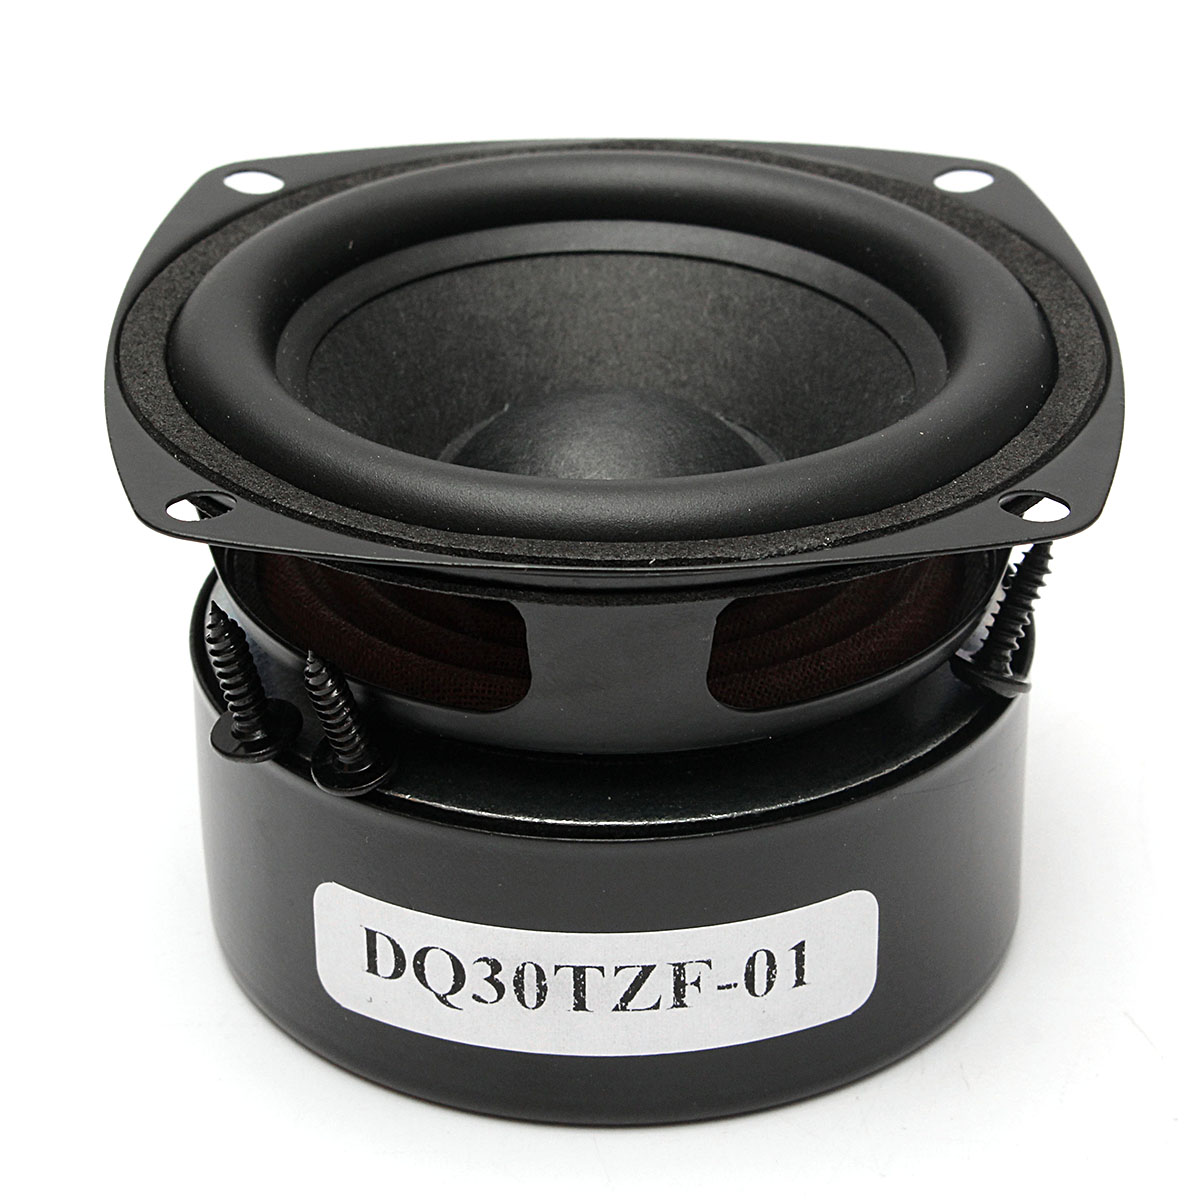 hight resolution of please confirm the size and the power before install the speakers to you car htb10jhnlvxxxxxnxxxxq6xxfxxxk htb1aknelvxxxxaaxpxxq6xxfxxx7